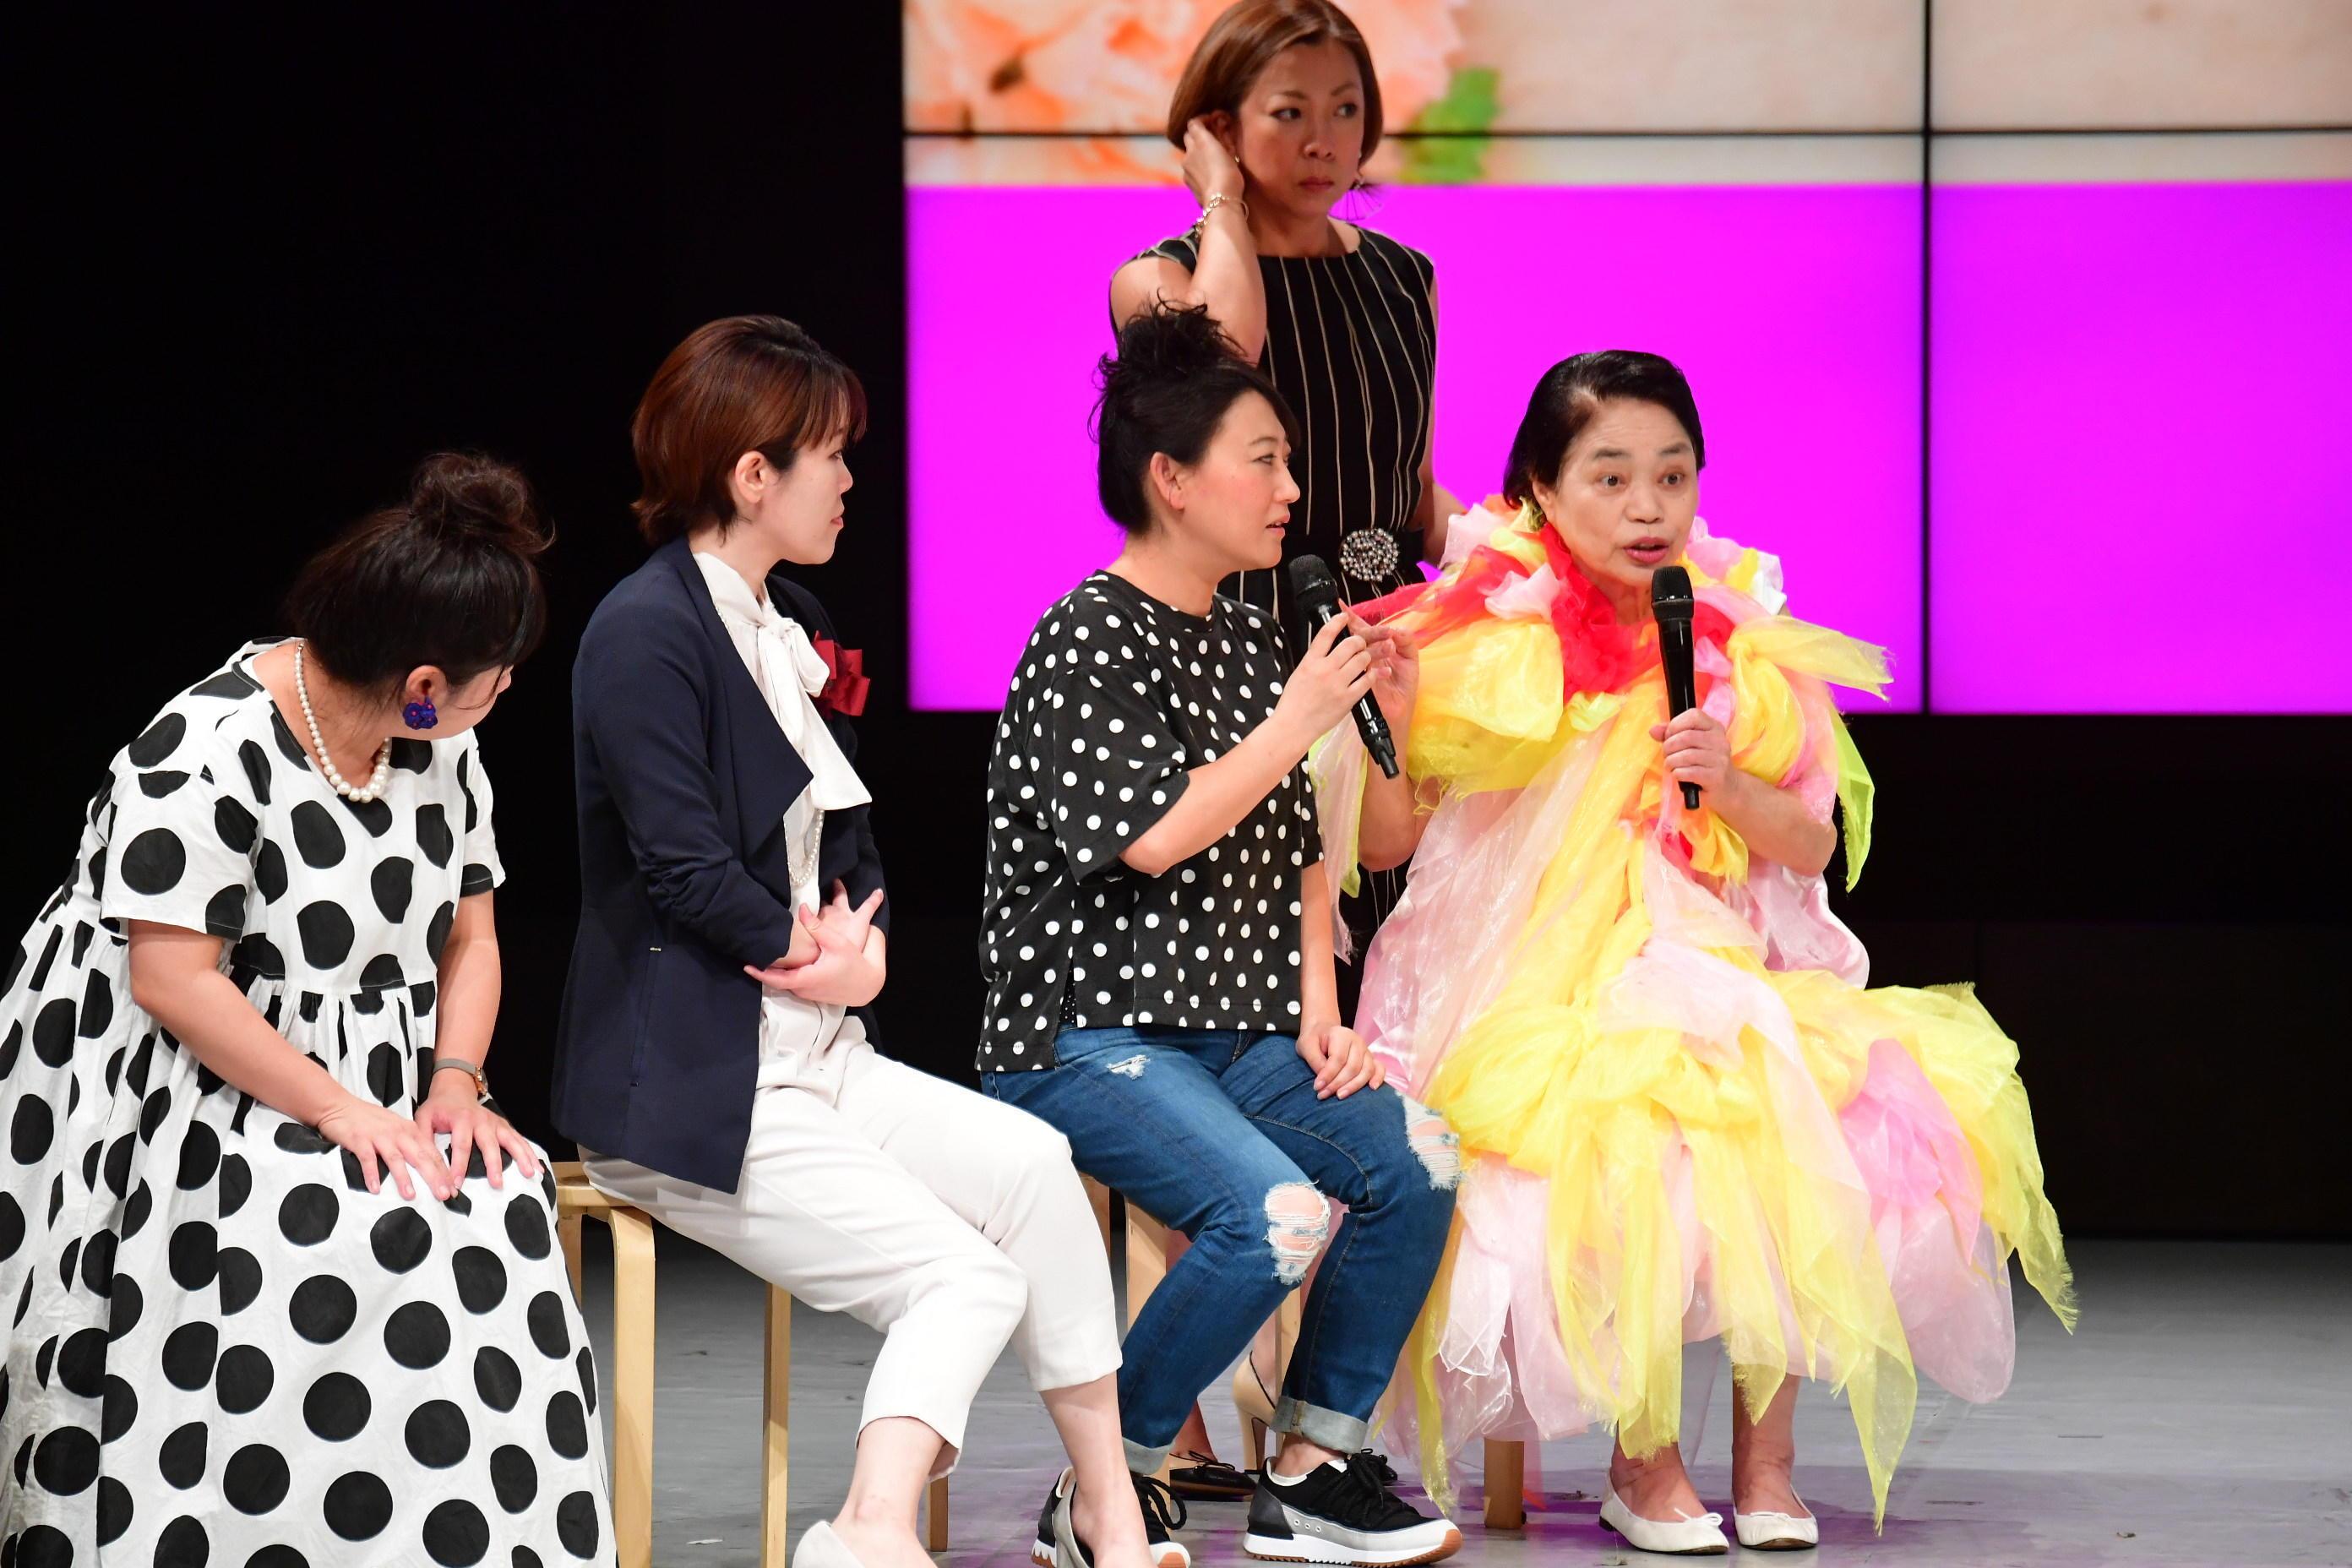 http://news.yoshimoto.co.jp/20180831235013-76abf90398de43ea8ffb2a01f1f63dae662beca9.jpg